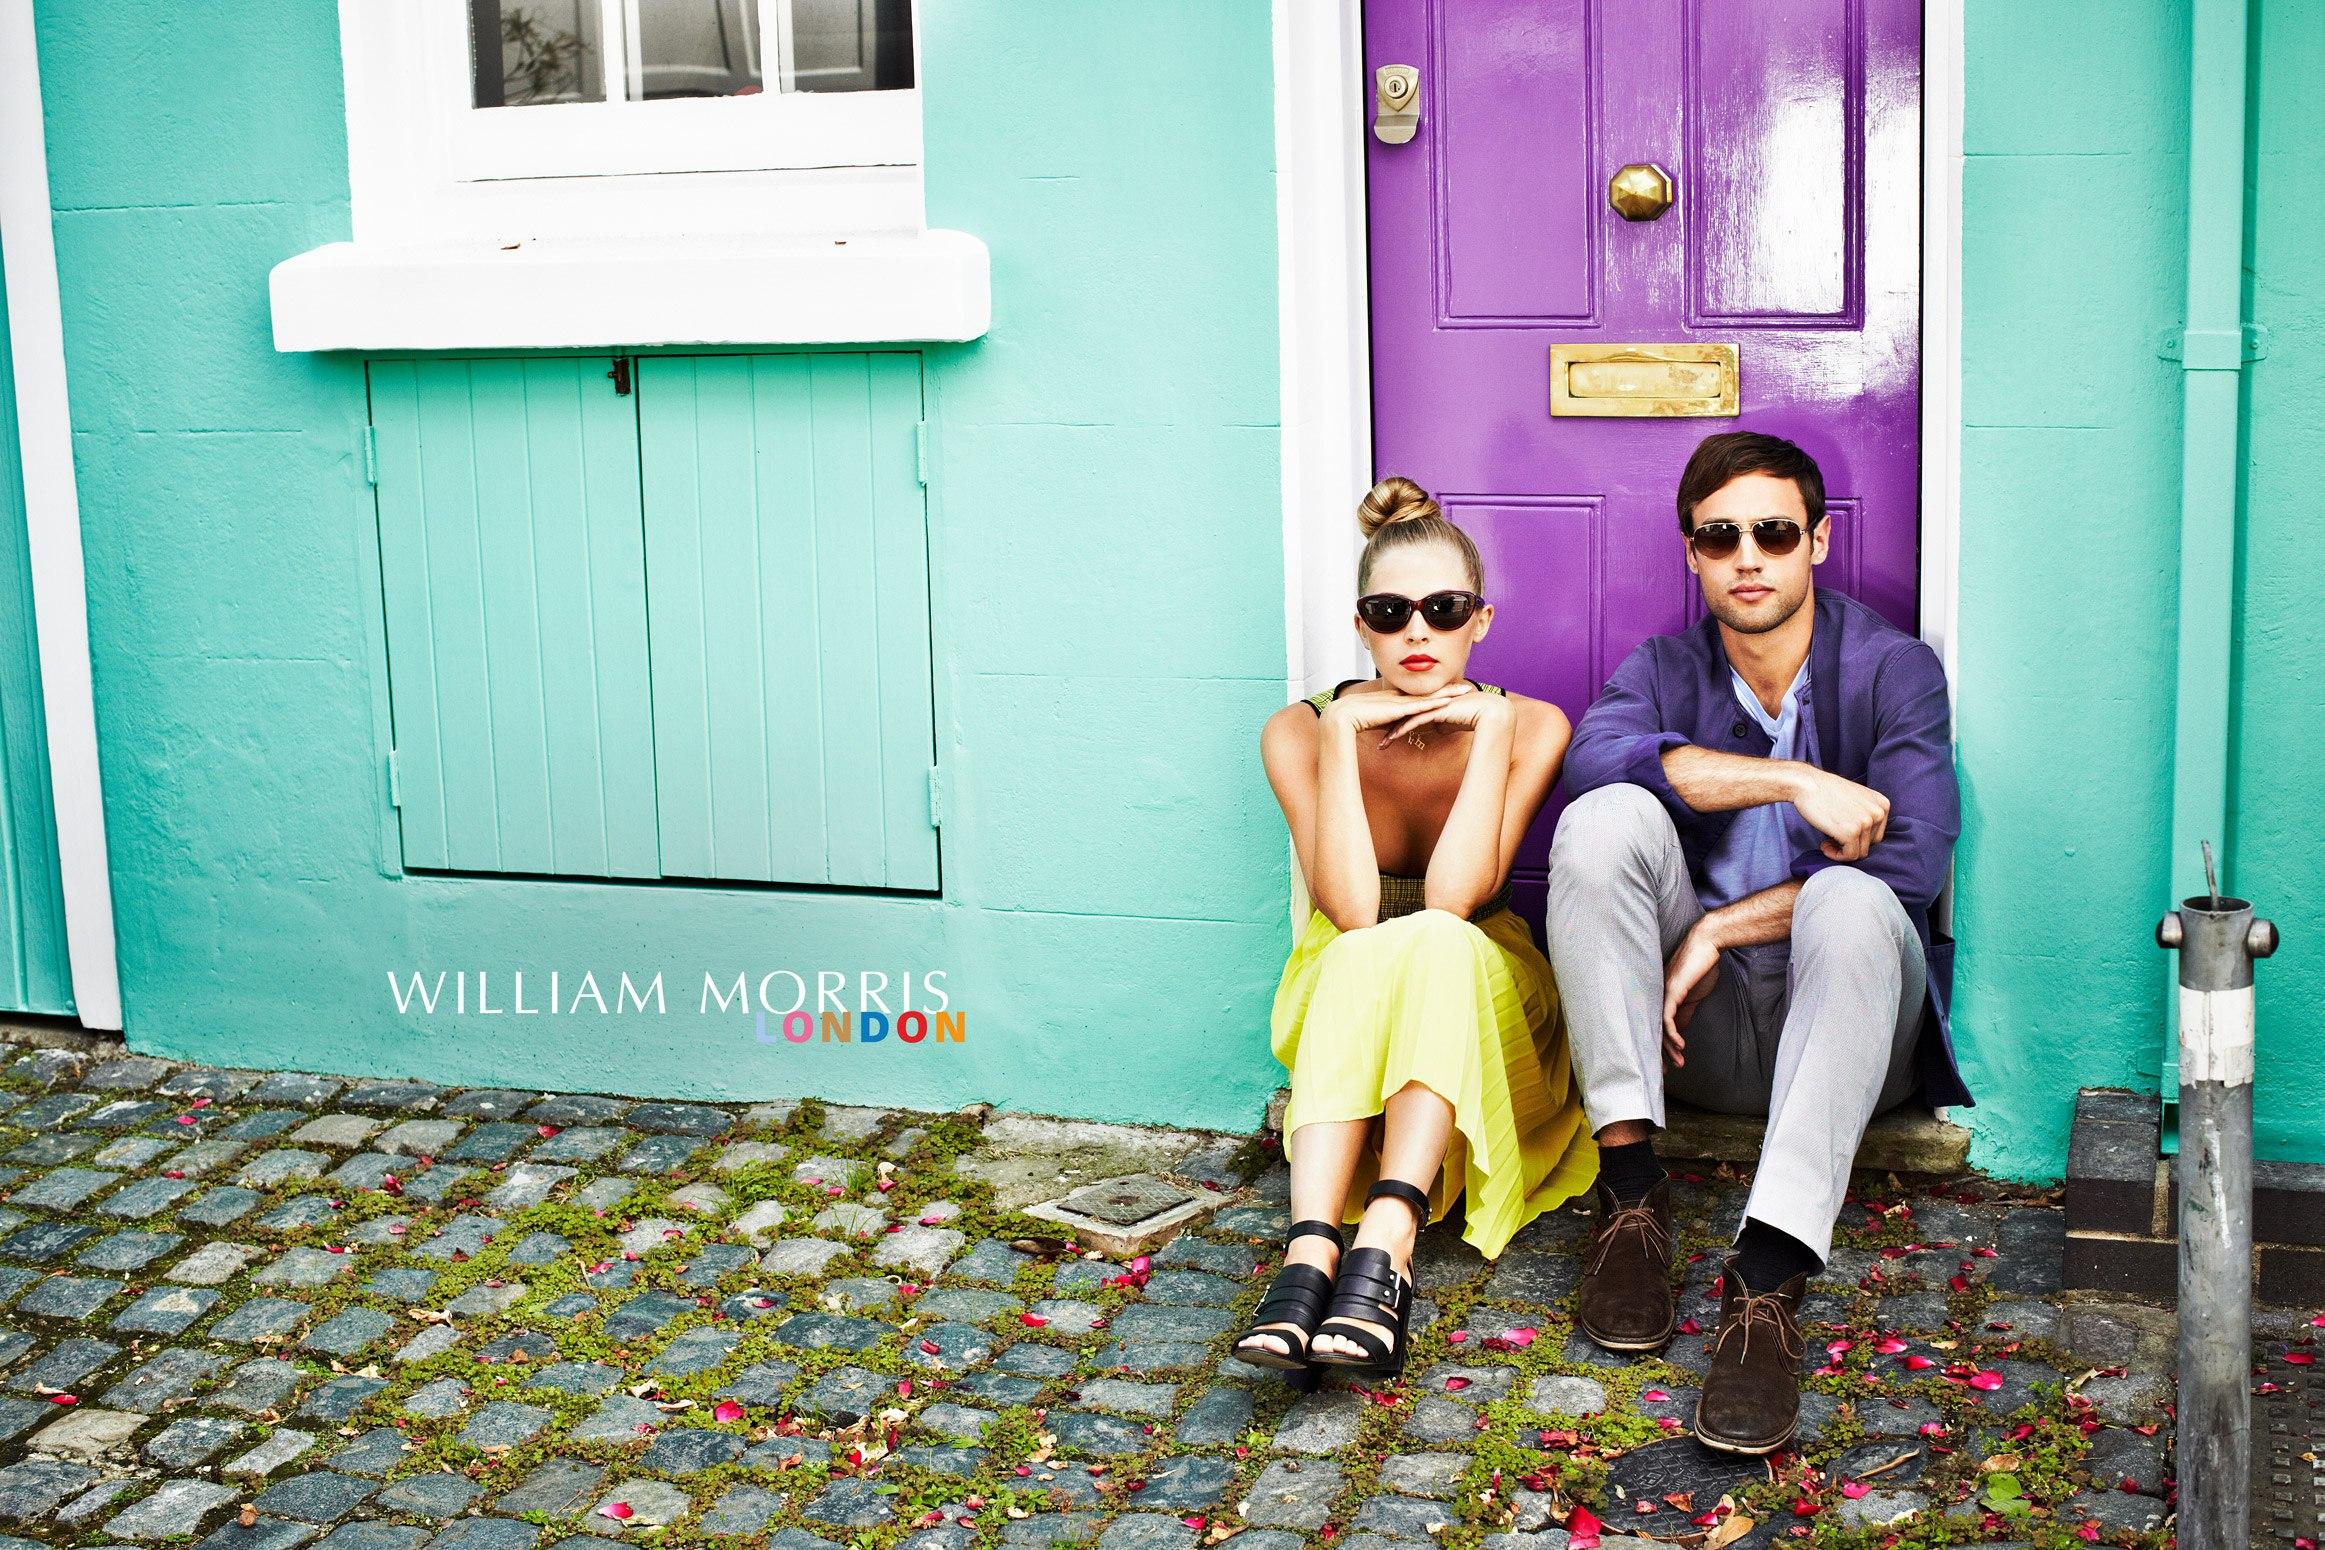 william-morris-ruth-rose-fashion-glasses-accessories-london-hermione-corfield-london-tourist-notting-hill-chelsea-fashion-boy-girl-colour-house-51